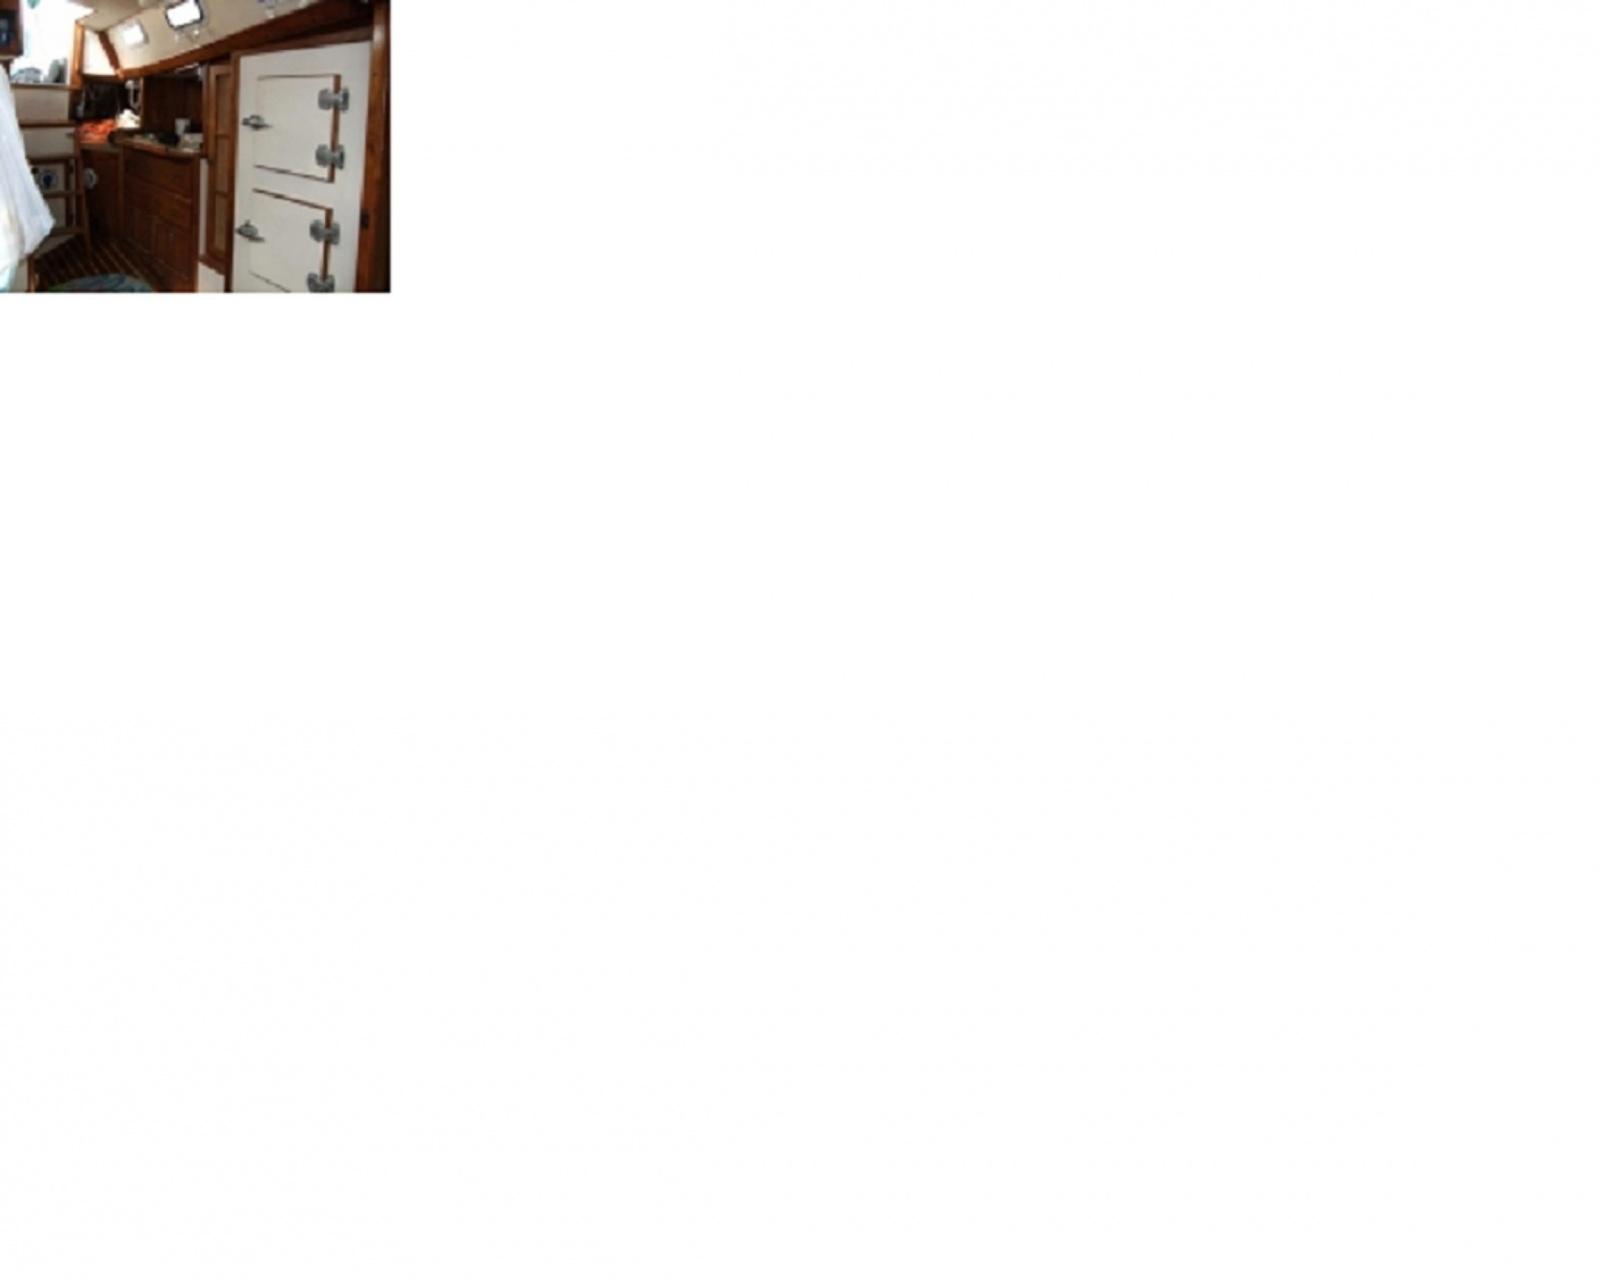 Click image for larger version  Name:fridge.jpg Views:74 Size:125.3 KB ID:18047